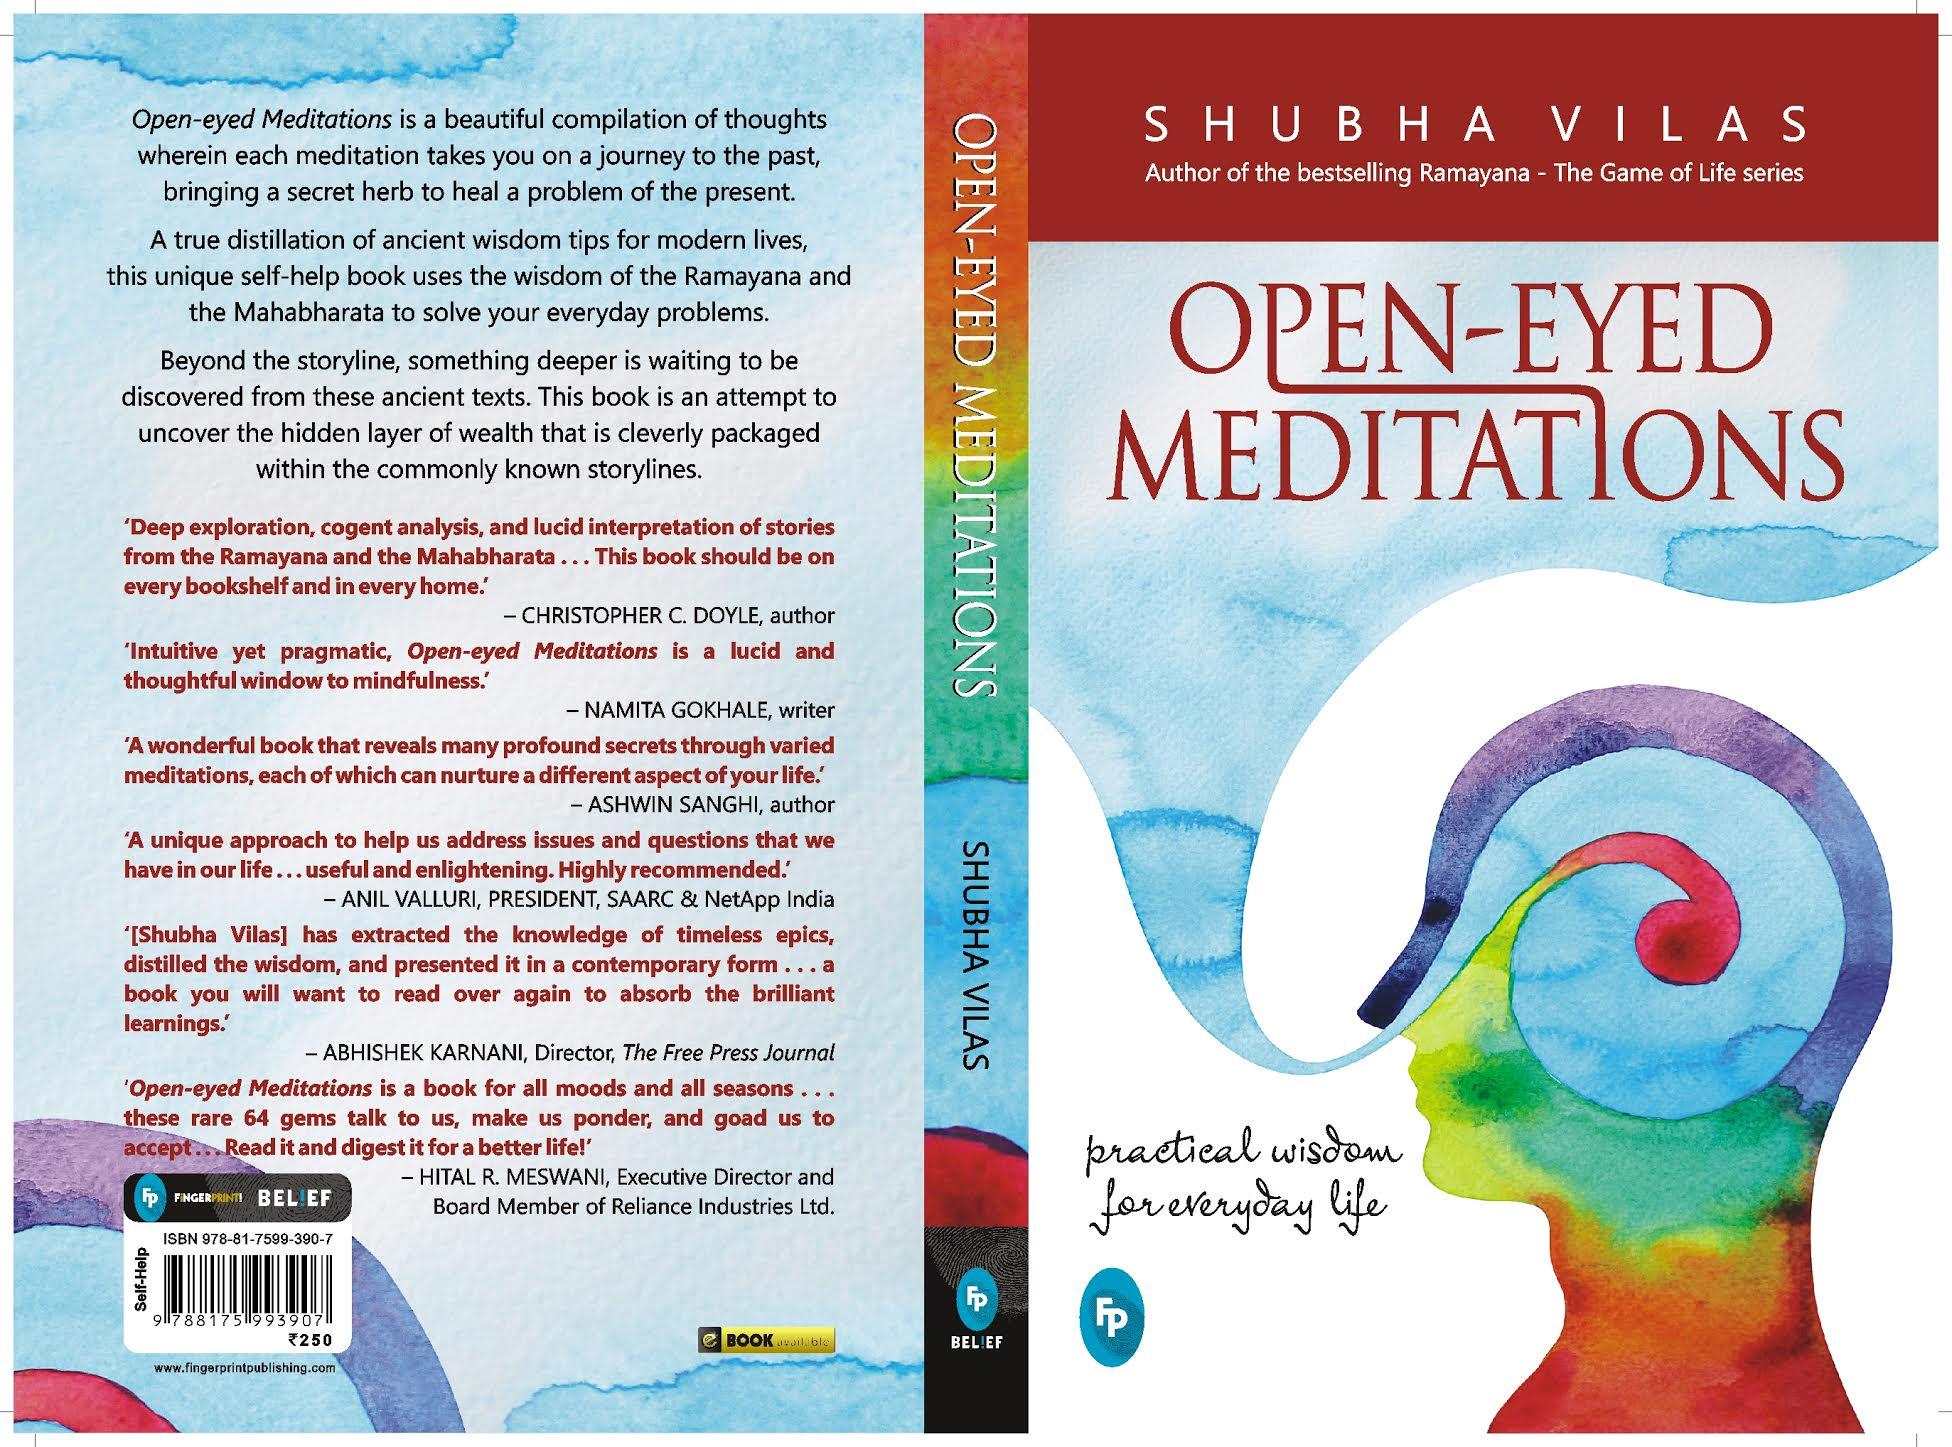 Open-Eyed Meditations